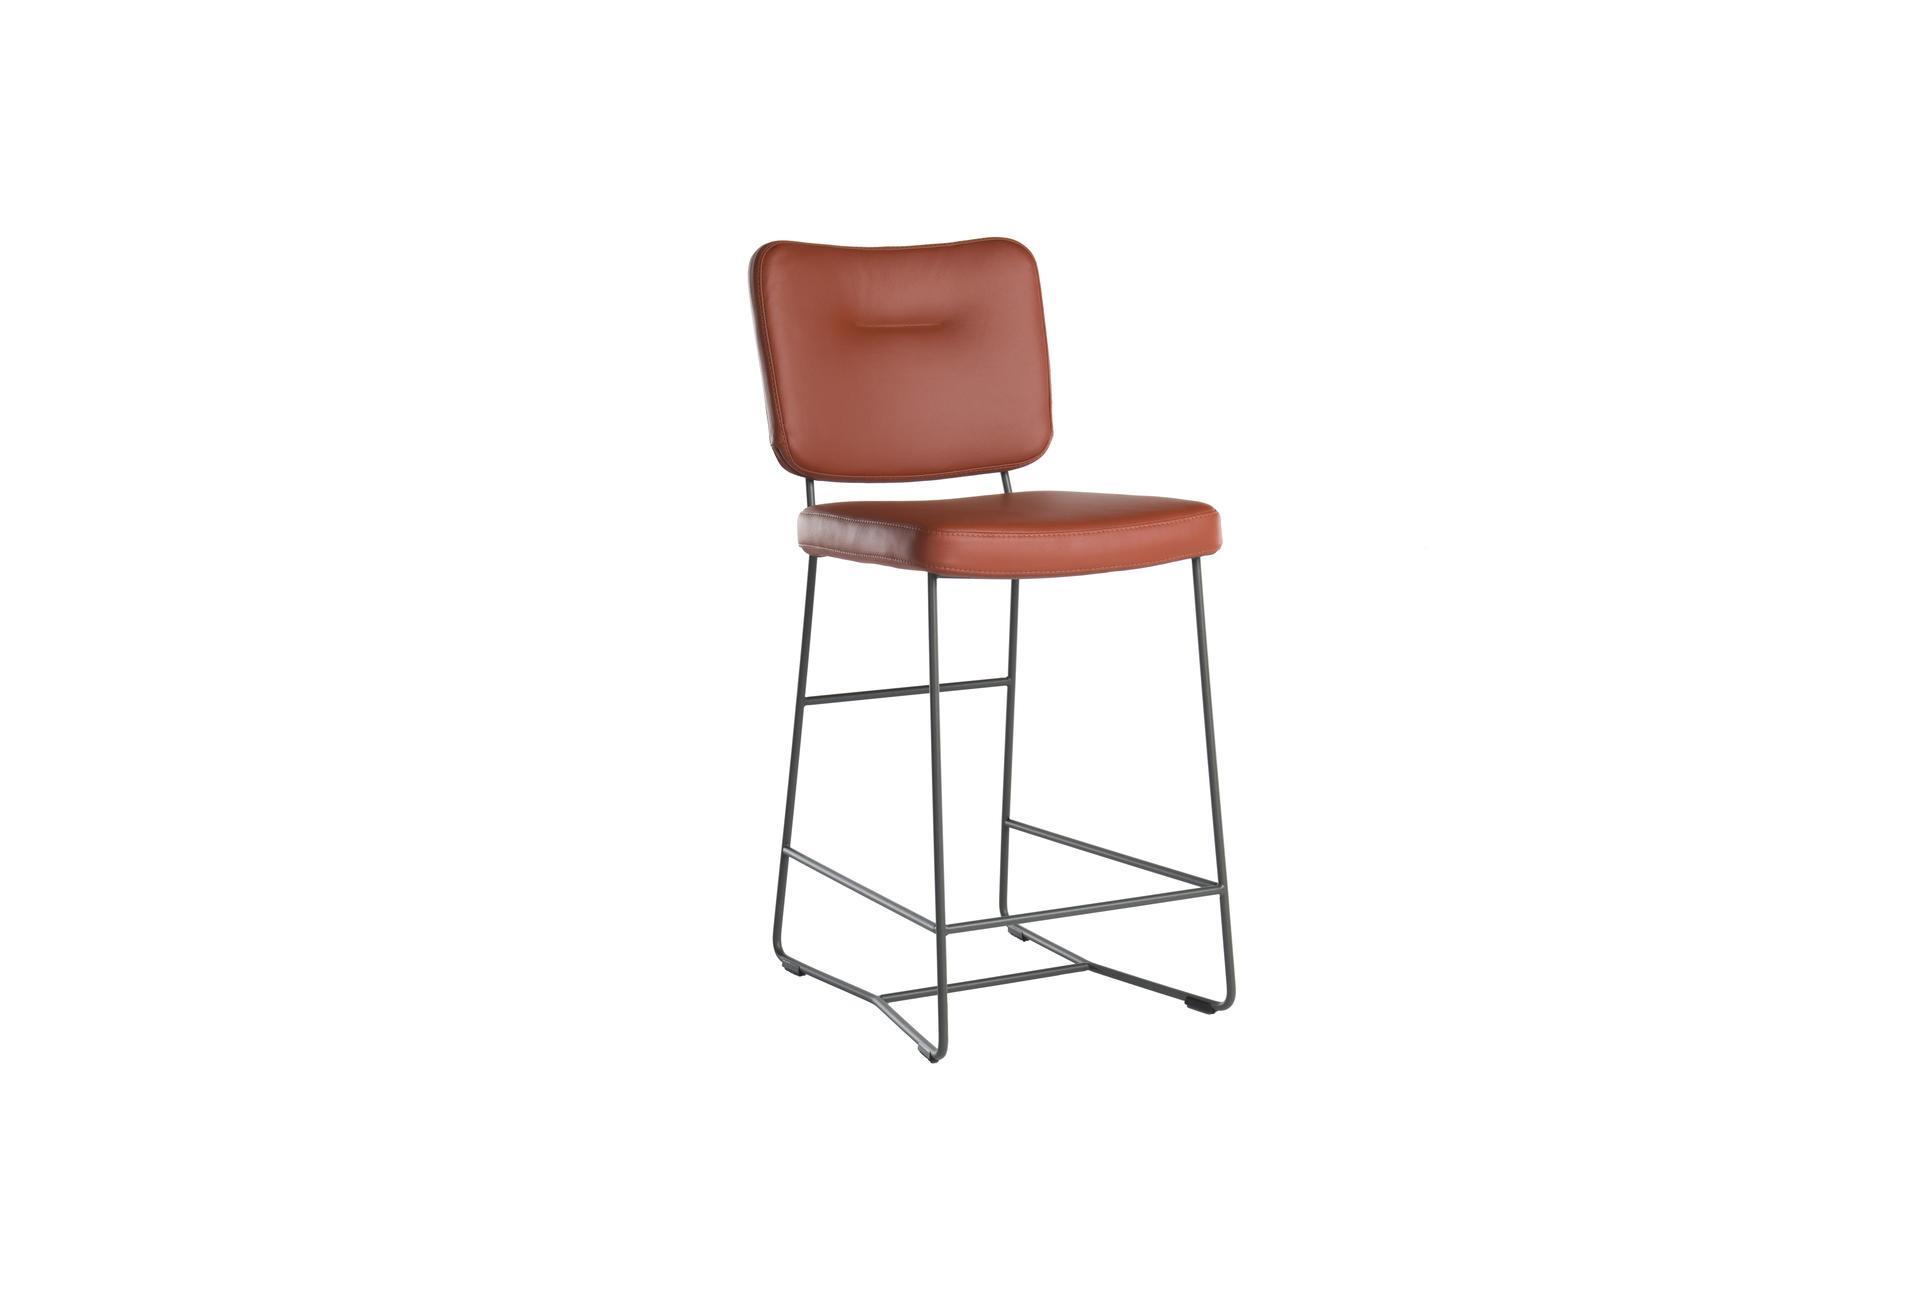 Барный стул стул Kiko, Bert Plantagie, фото 2